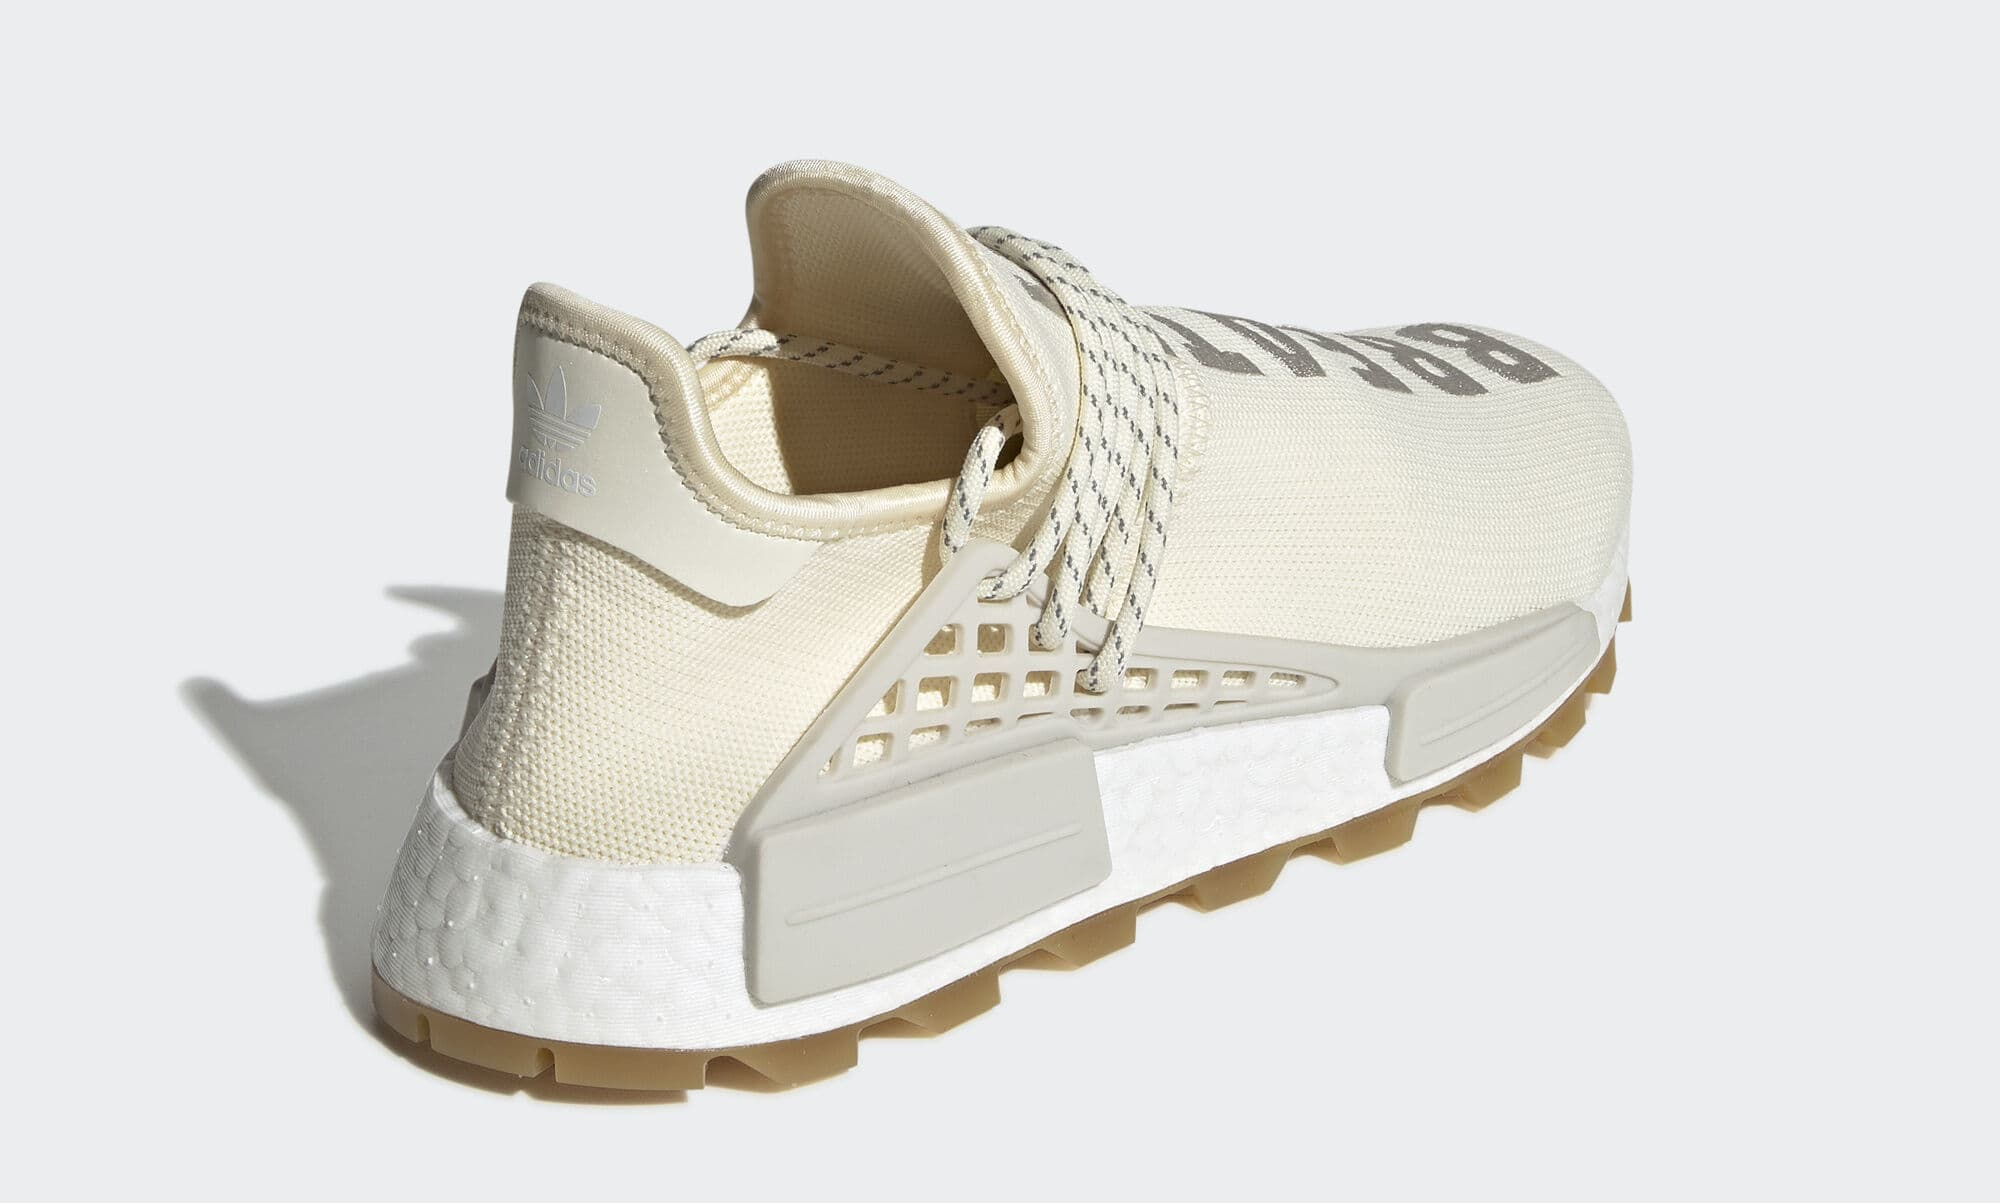 Pharrell x Adidas NMD Hu 'Gum' EG7737 (Heel)